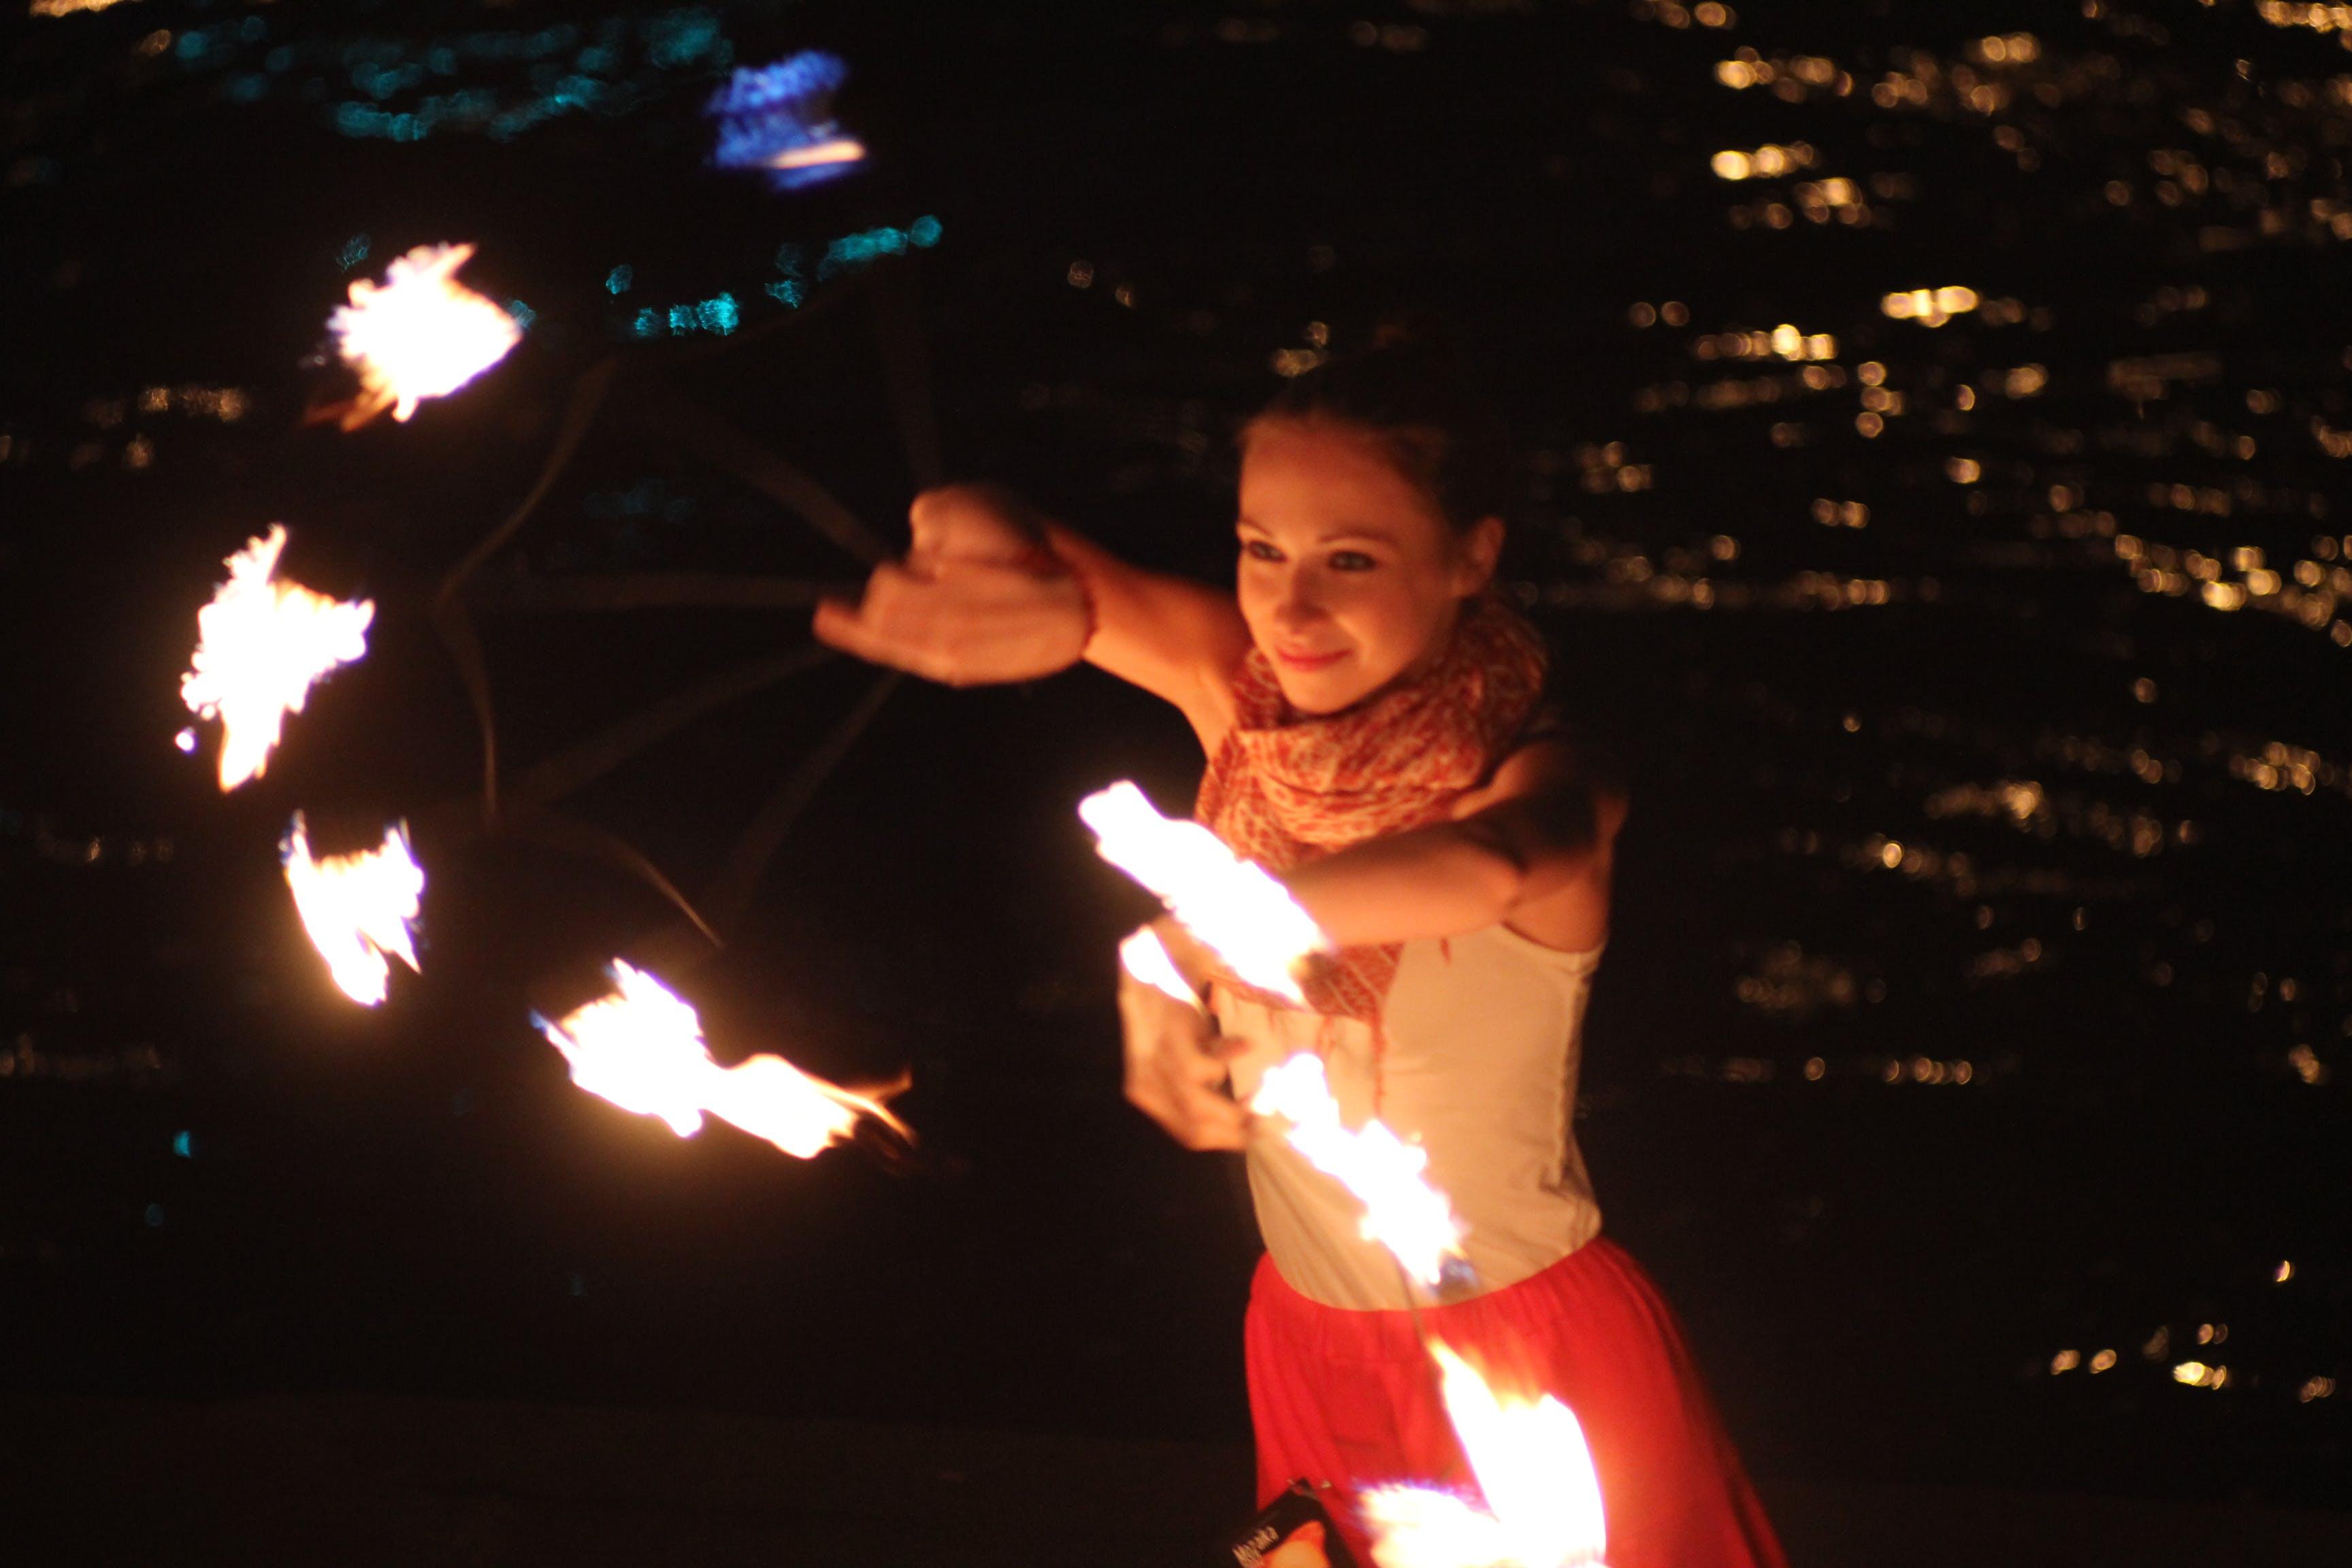 Free stock photo of Vilnius RIverside Fire Show